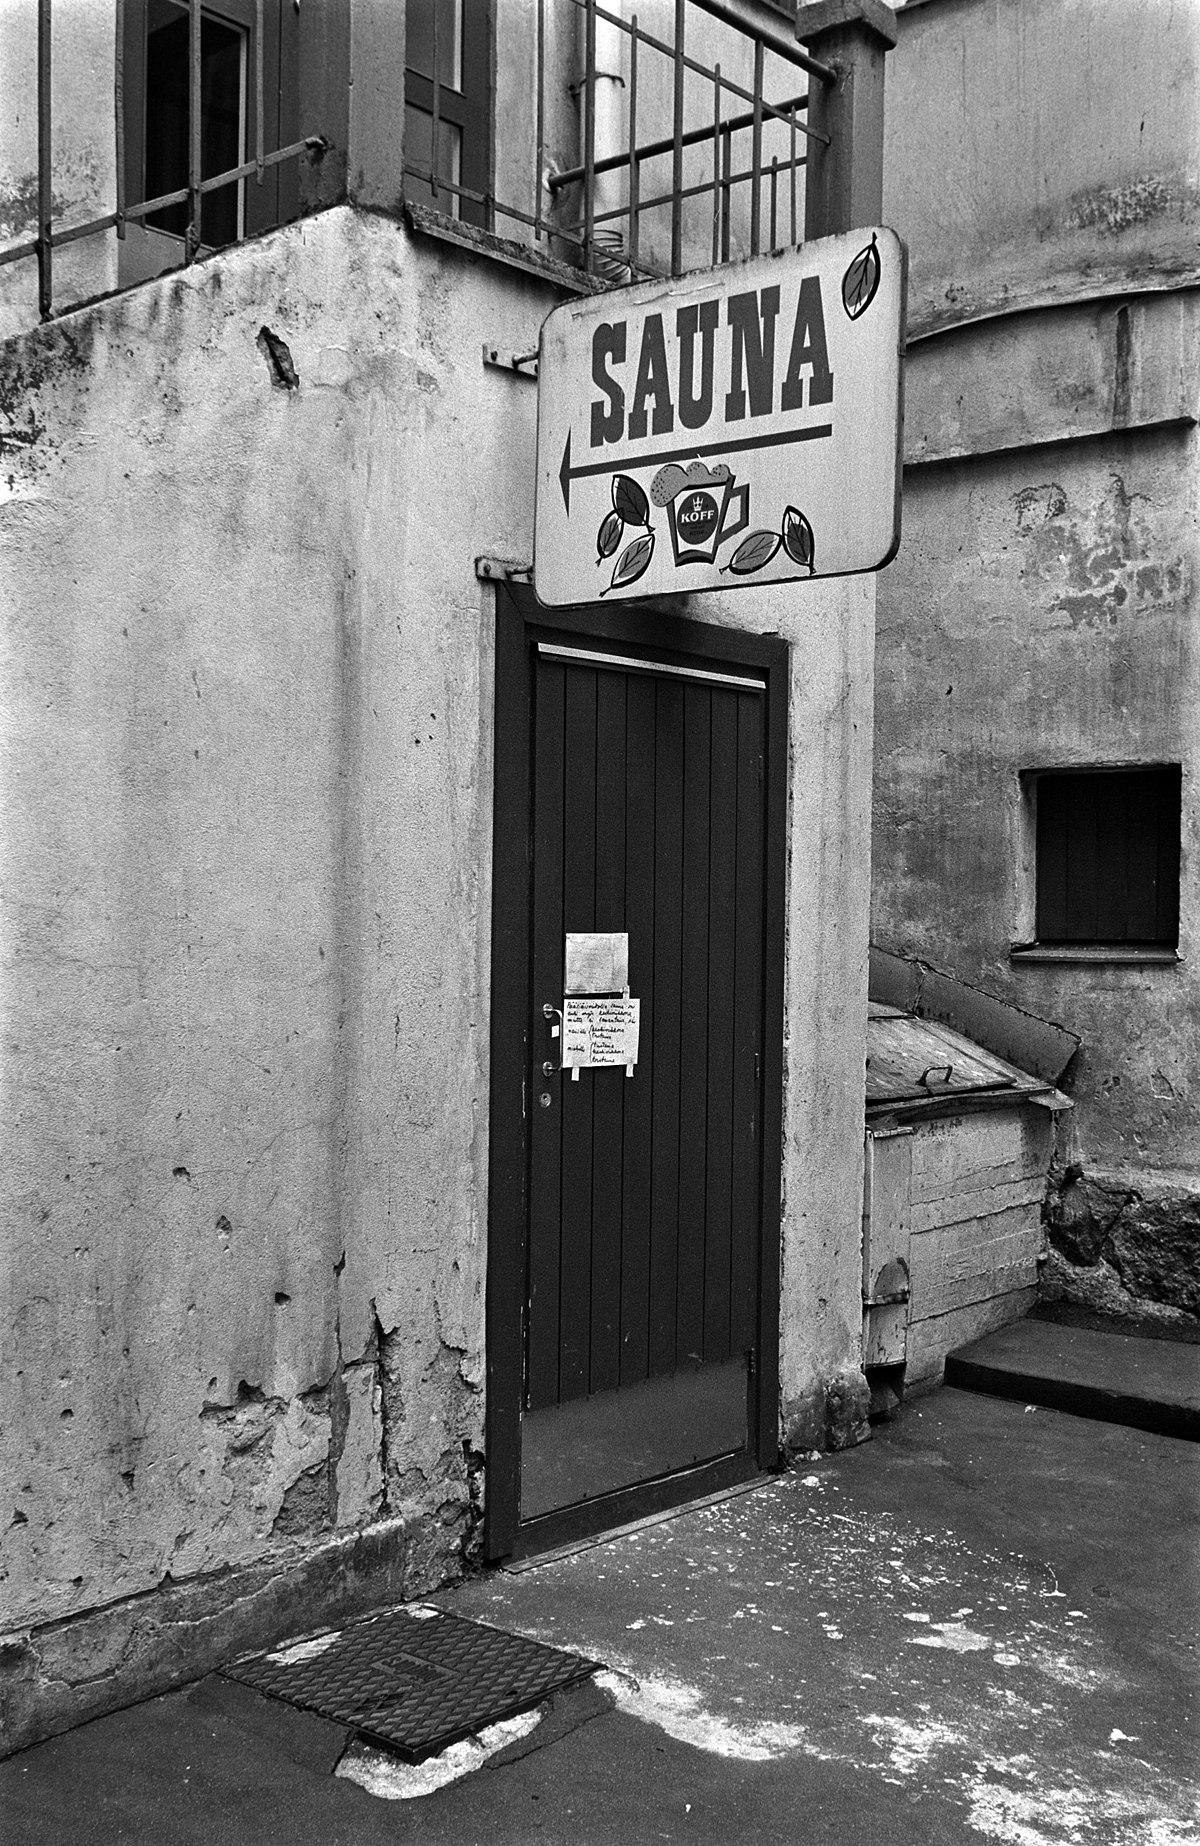 Public Sauna Helsinki